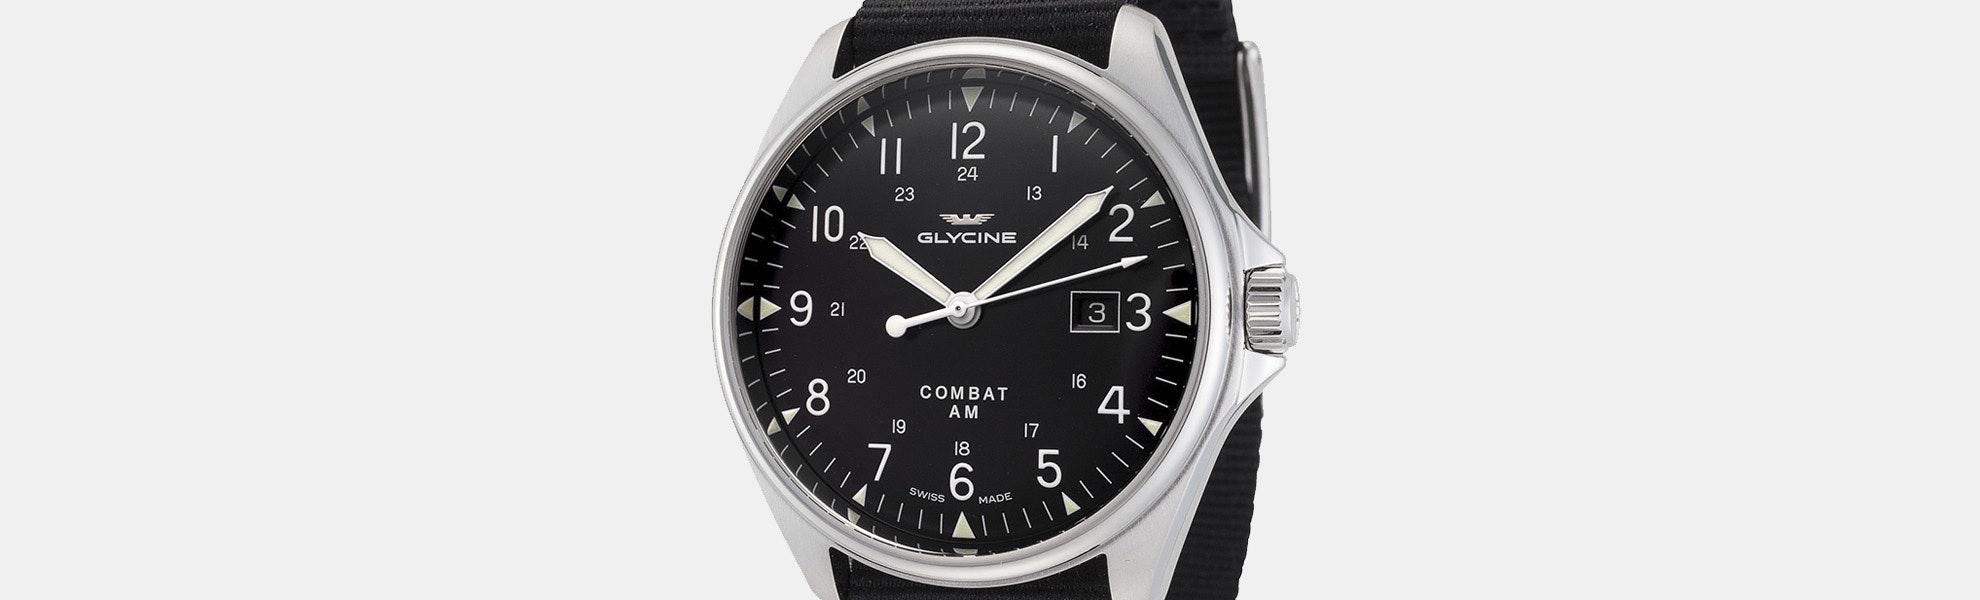 Glycine Combat 6 Classic Automatic Watch